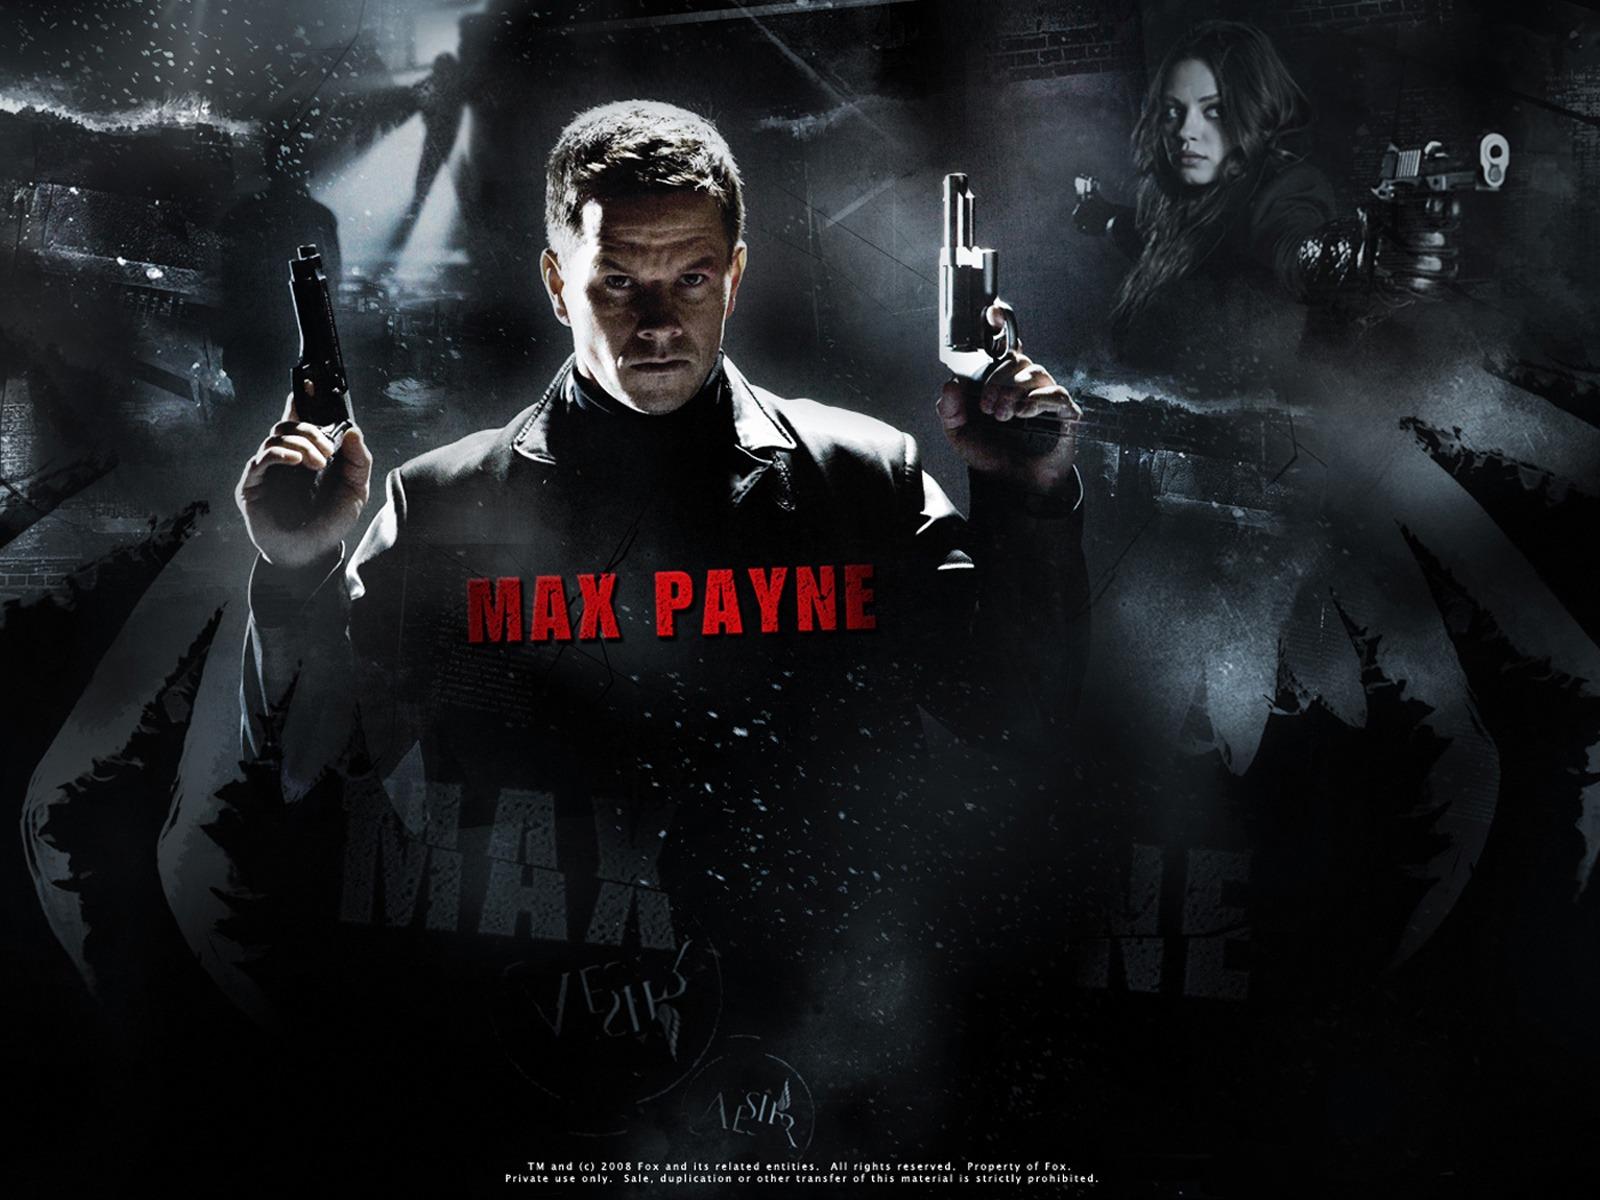 Best Wallpaper Movie Max Payne - max_payne_movie_wallpaper_mark_walberg_male_celebrities_794  Graphic_803376.jpg